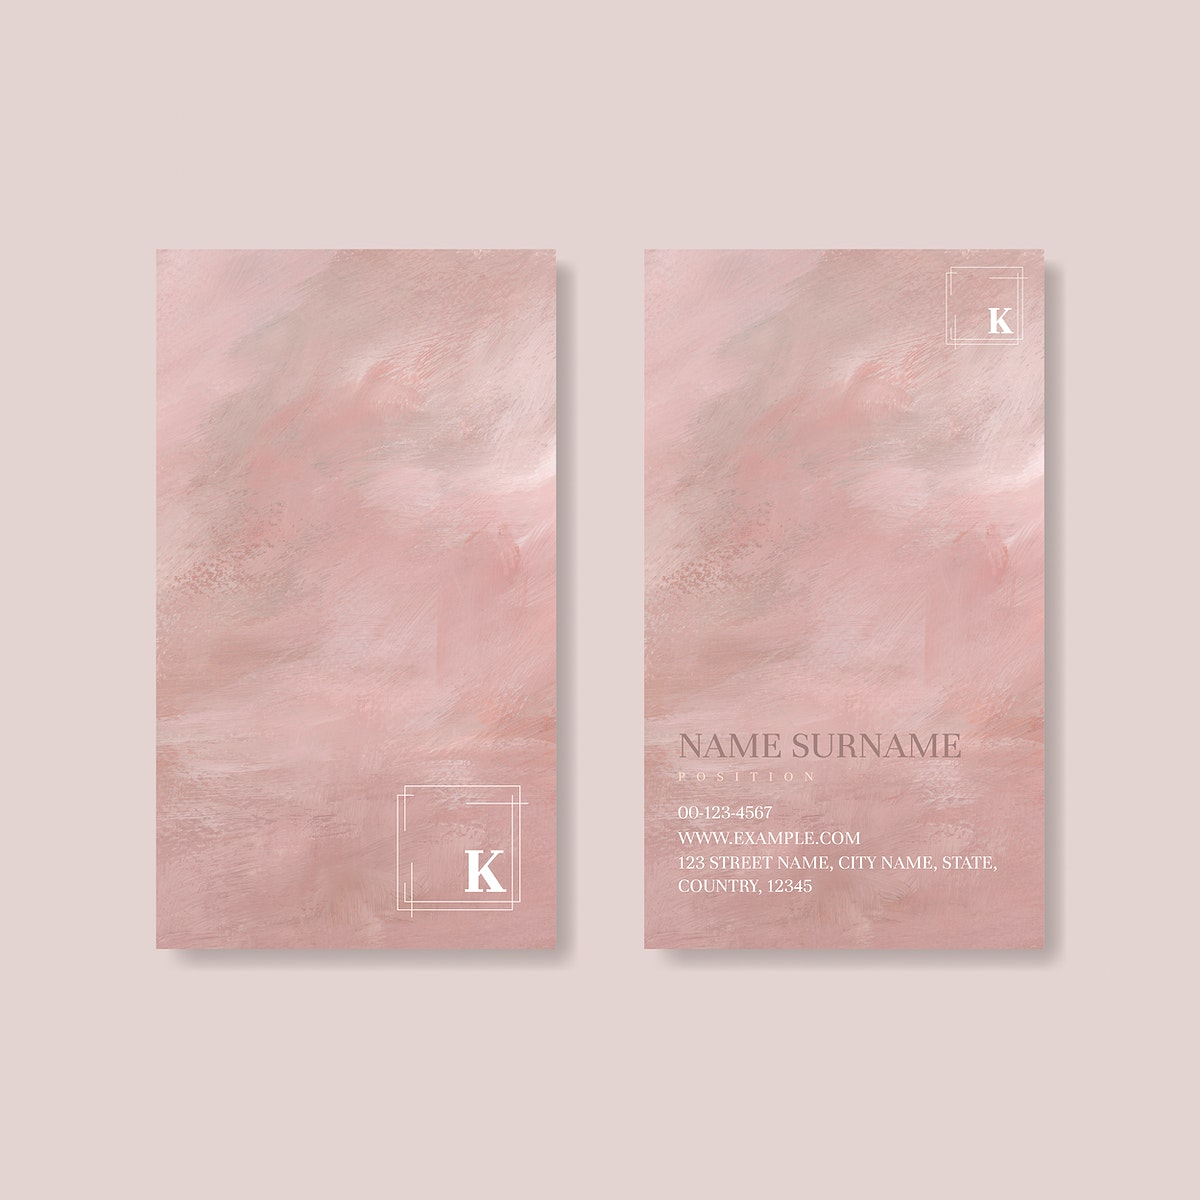 Pink business card design vector